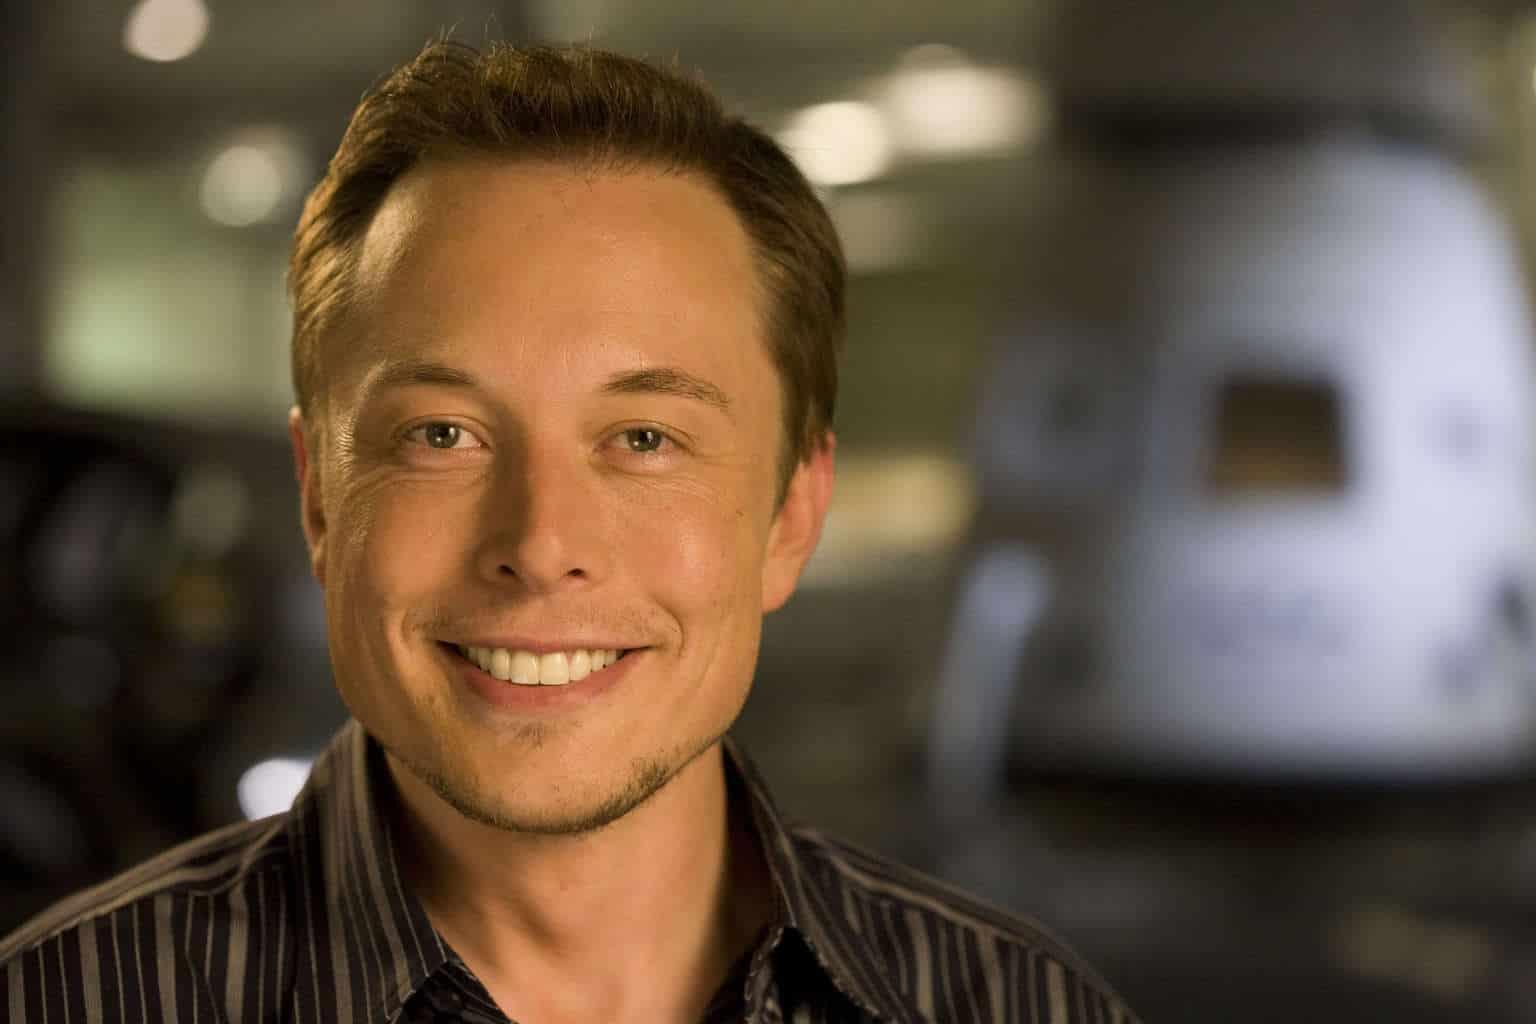 Tesla Motors Inc NASDAQ:TSLA